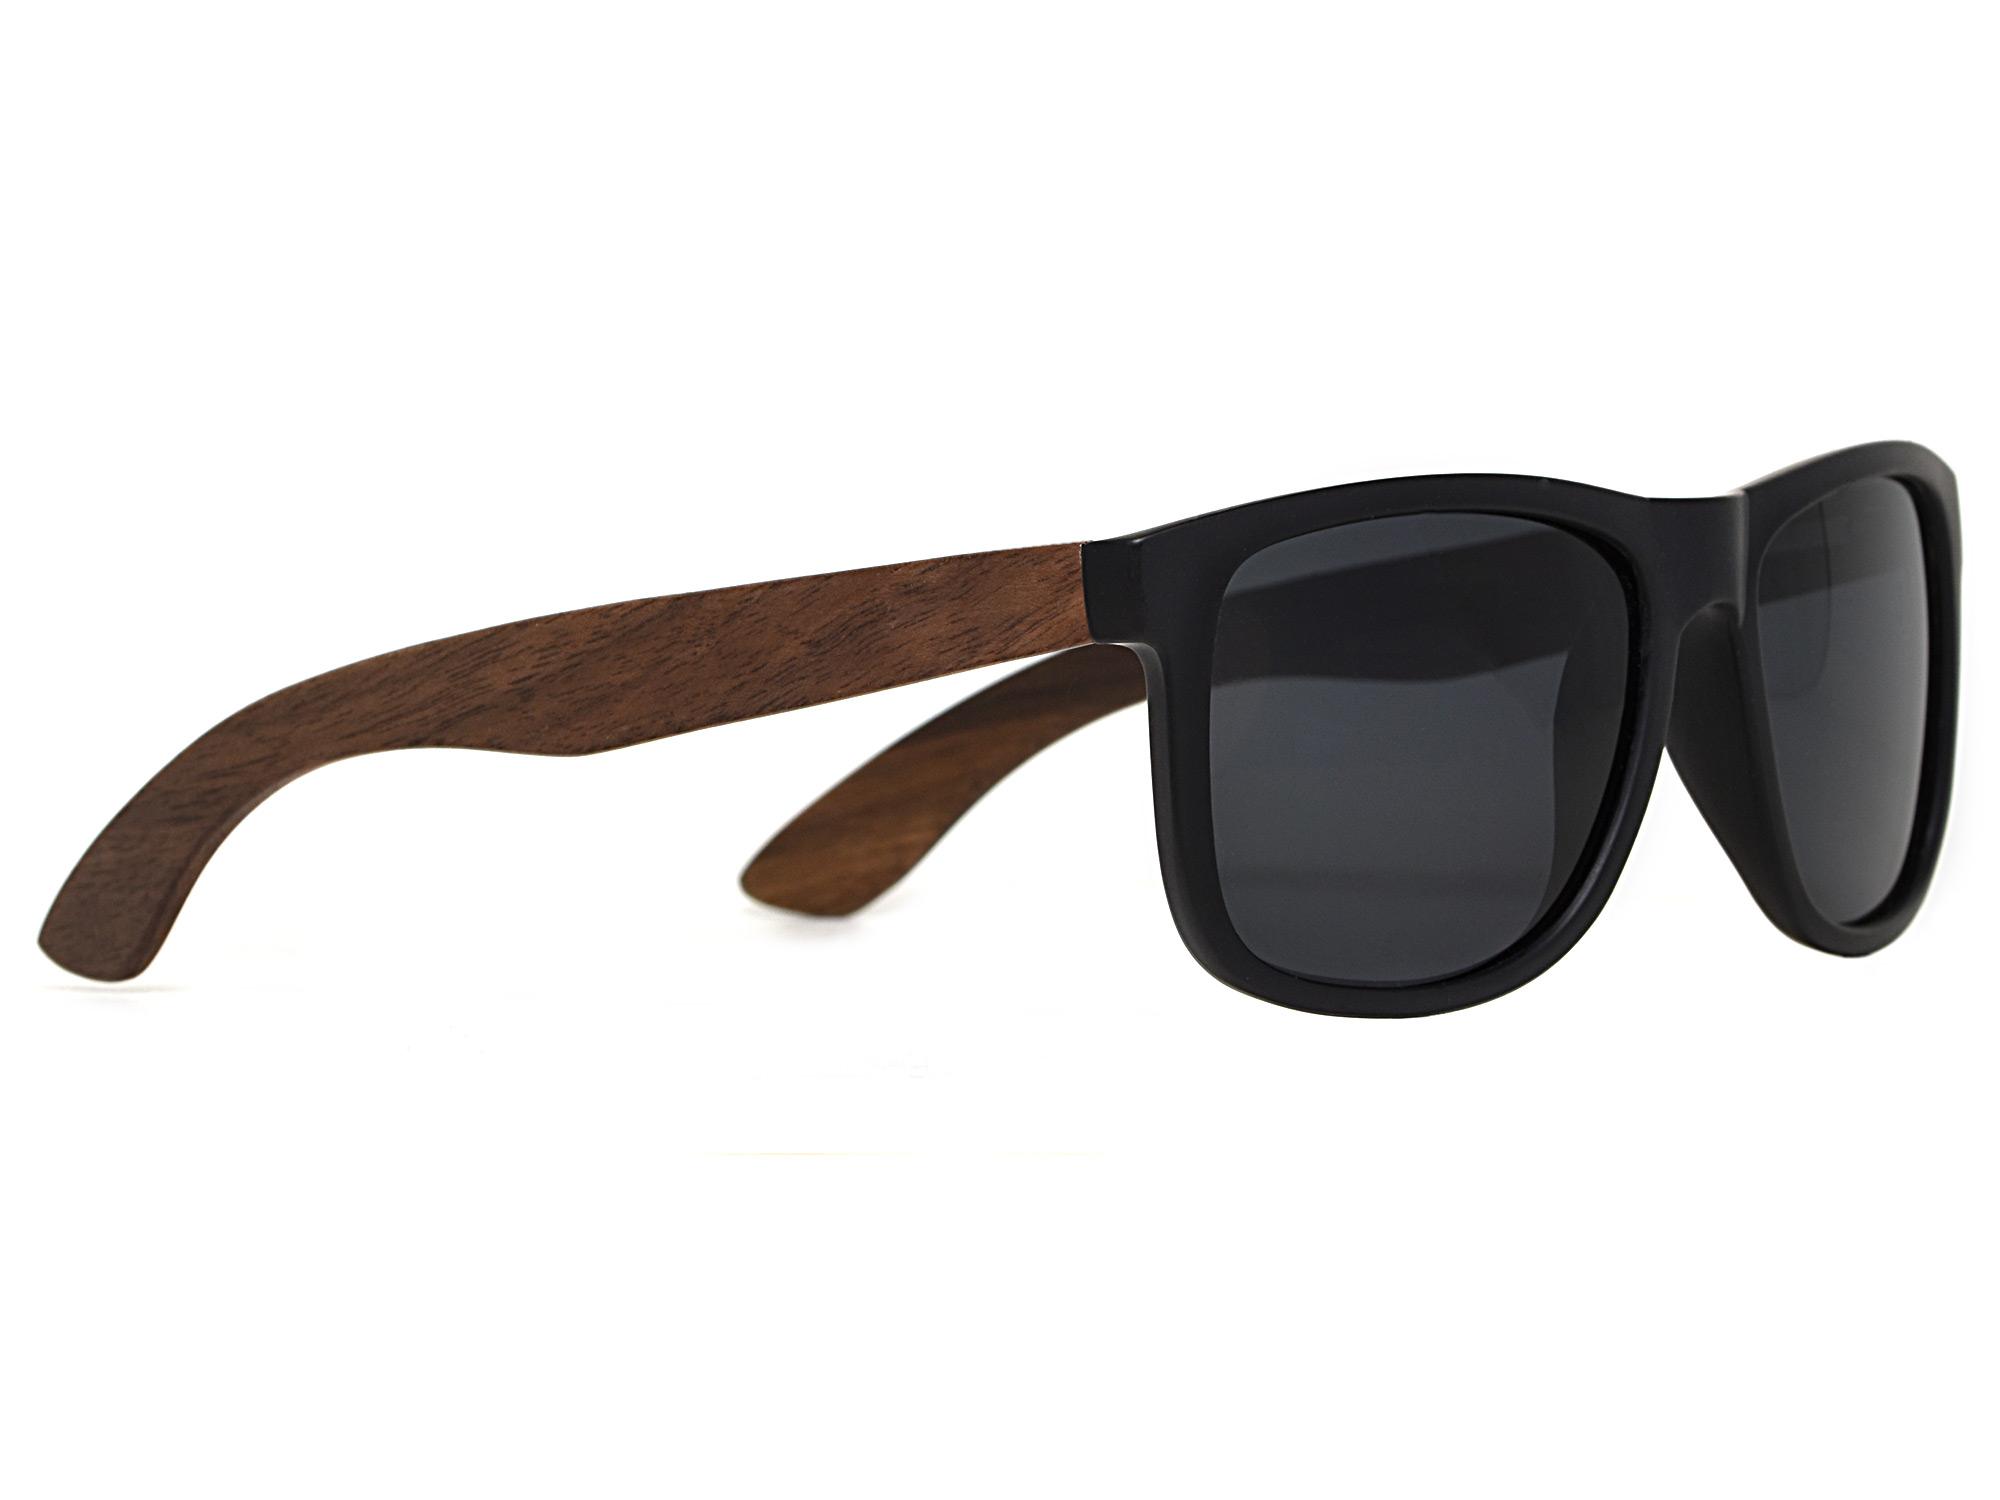 Square walnut wood sunglasses with black polarized lenses right